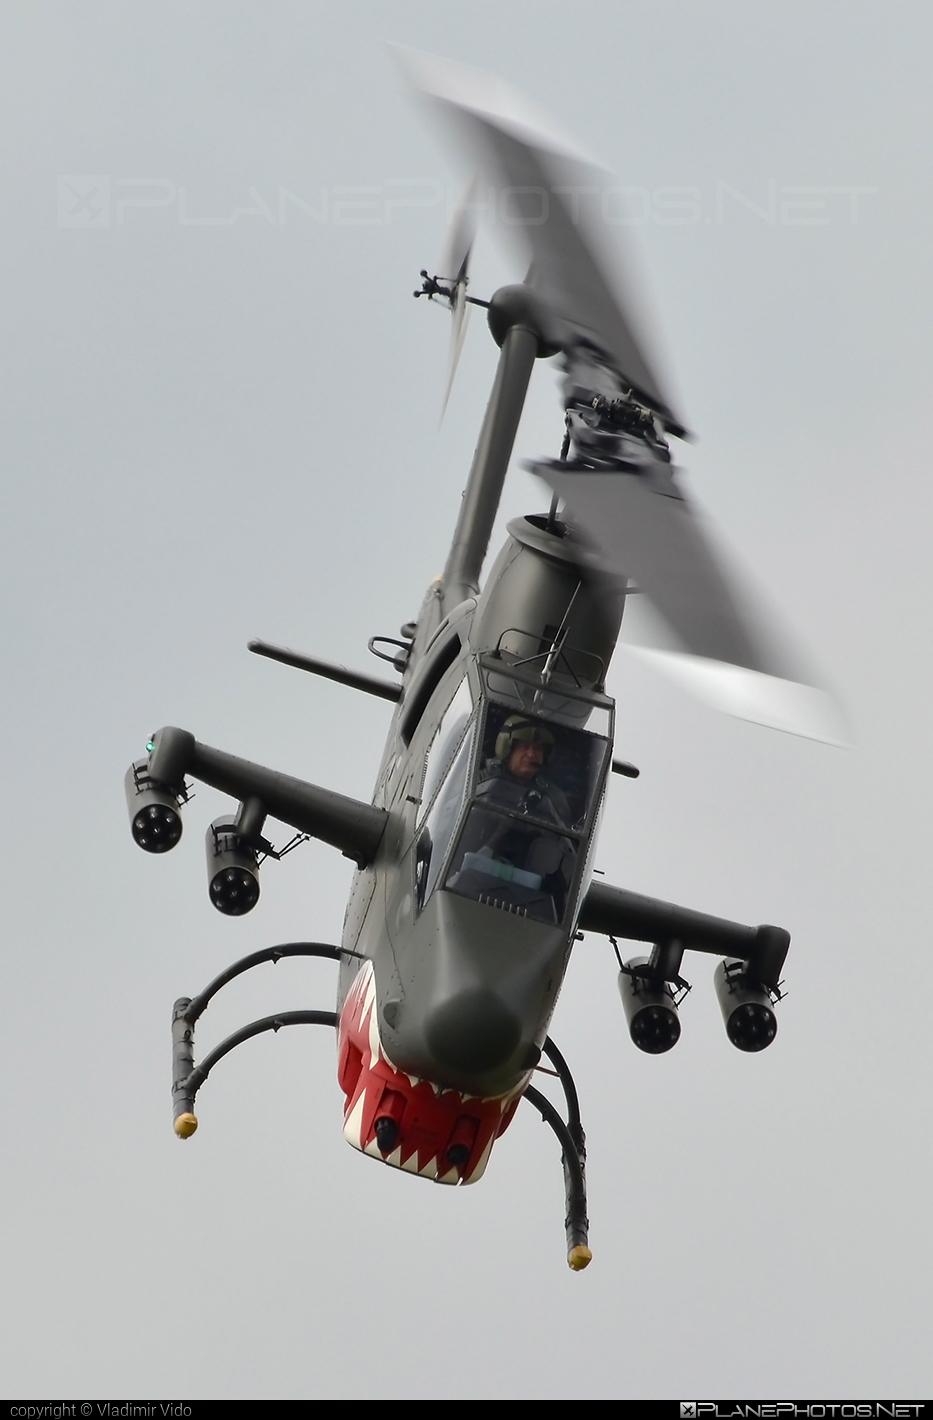 Bell TAH-1P Cobra - OK-AHC operated by HELI CZECH s.r.o. #ah1 #ah1cobra #bell #bellcobra #bellhelicopters #belltah1pcobra #heliczech #tah1pcobra